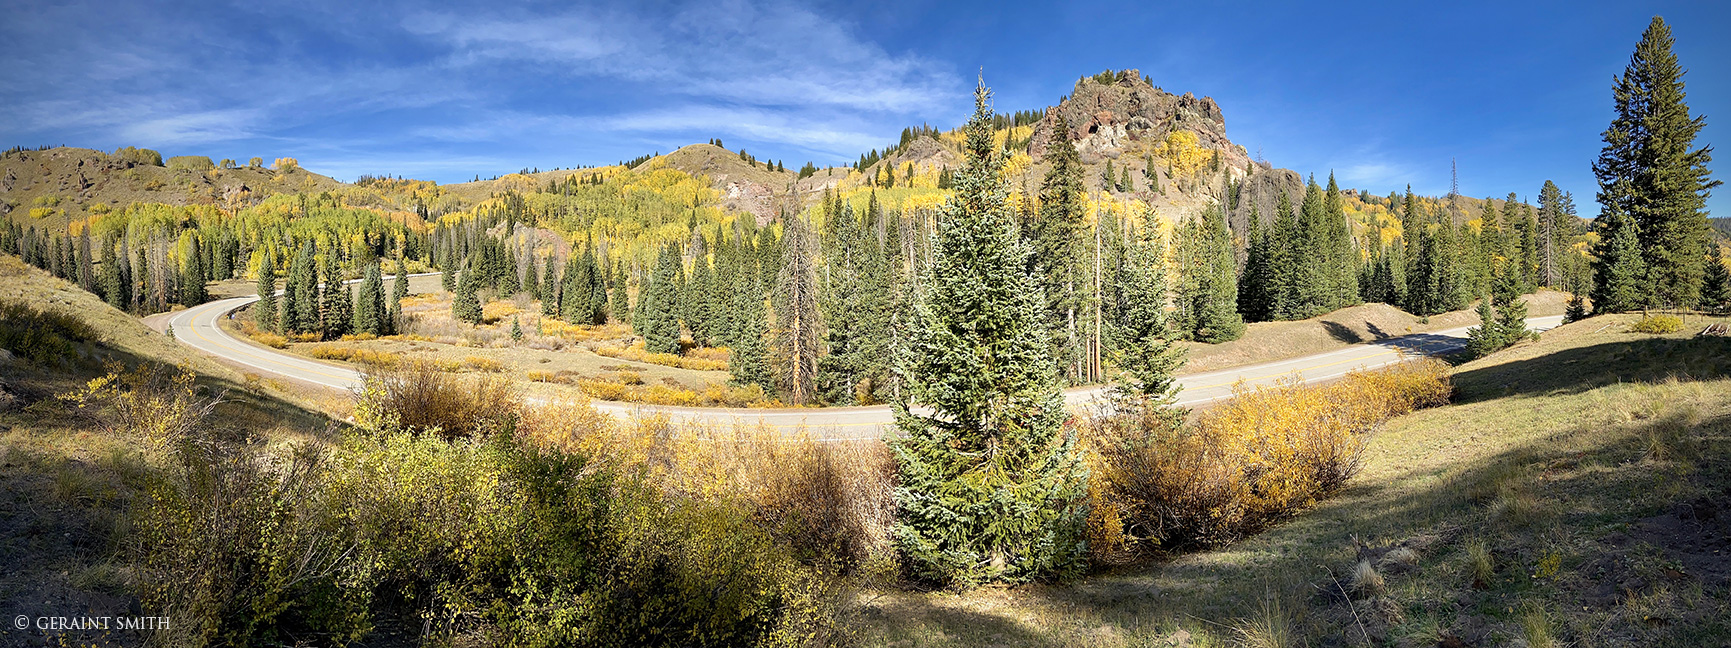 Panorama, Fall Color, Cumbres Pass, Colorado.